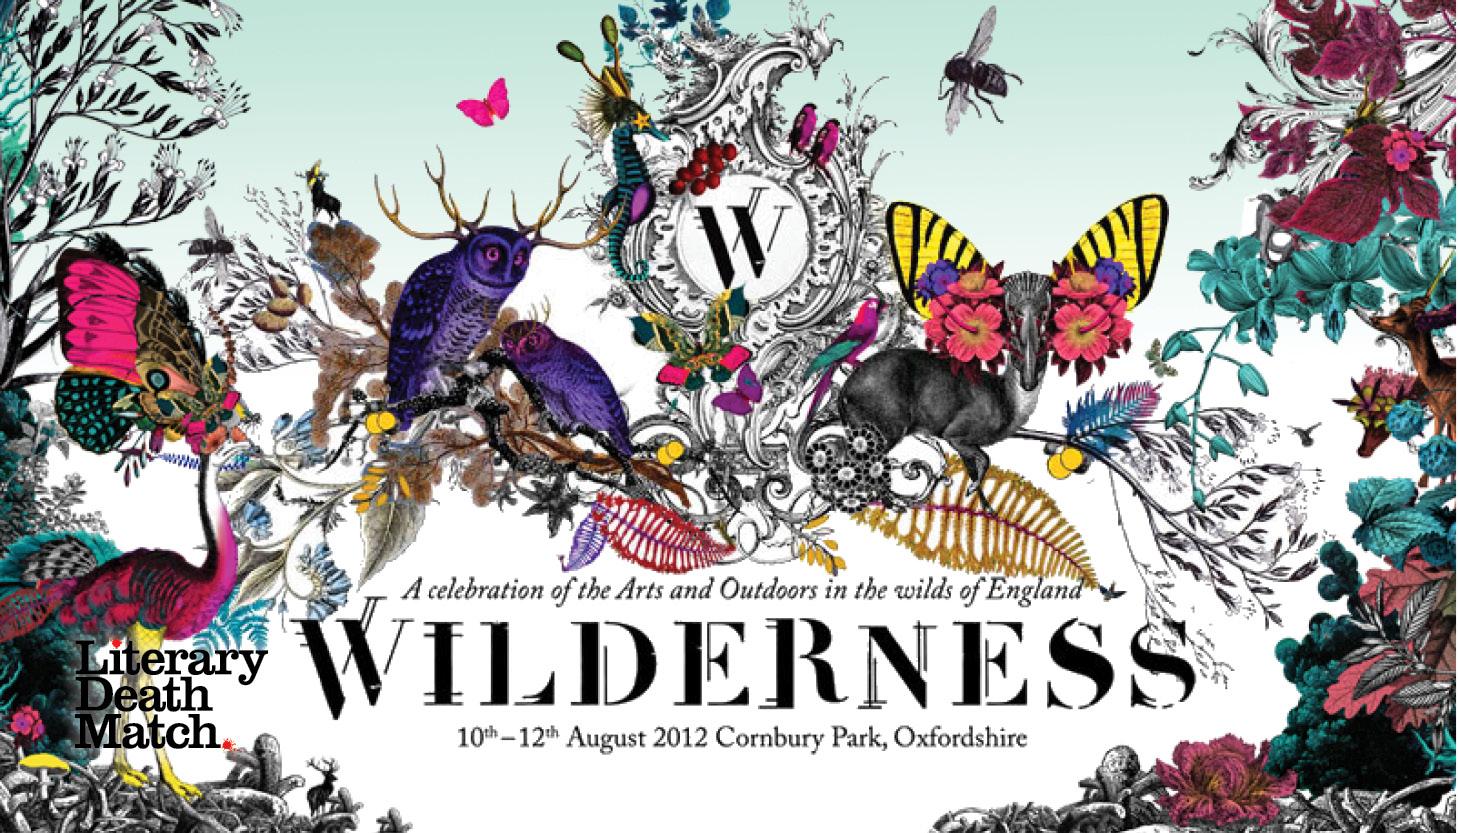 Wilderness festival ep 1 journal literary death match malvernweather Images